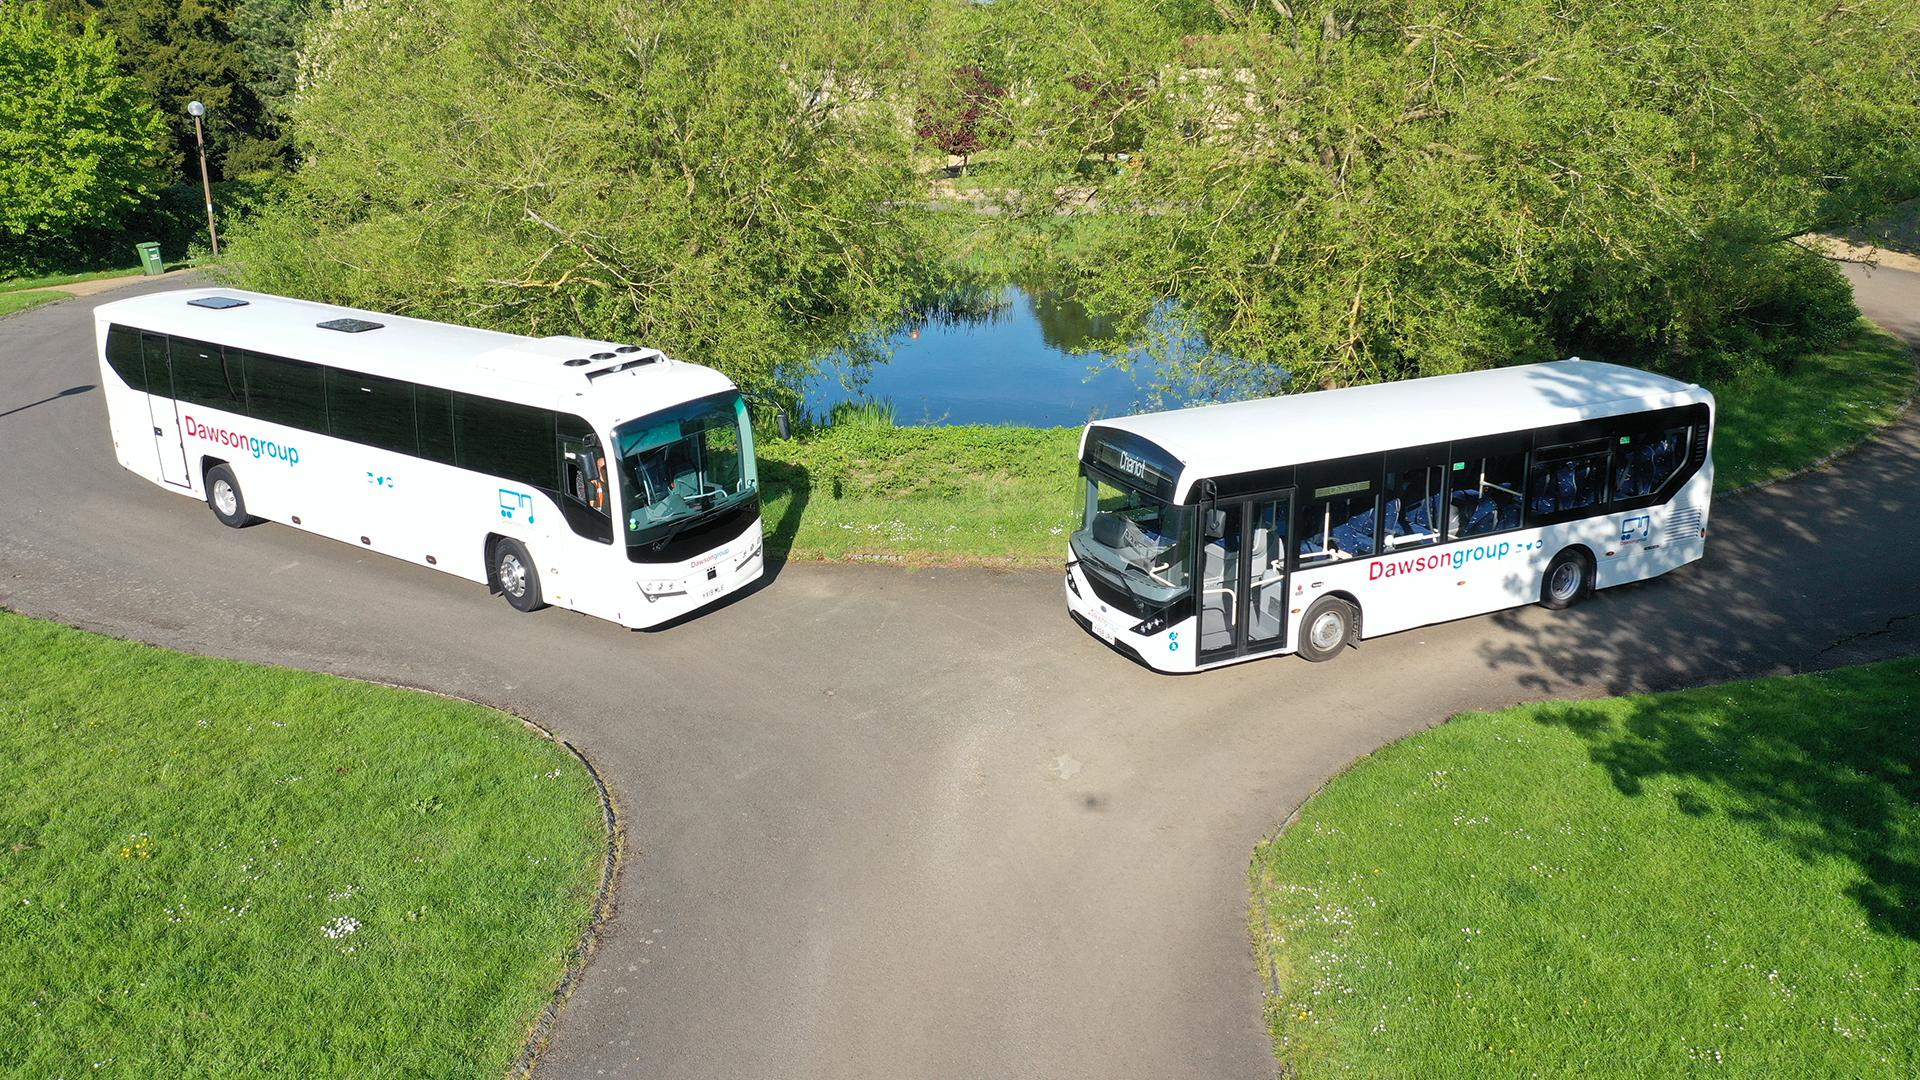 Challenging the decline in rural bus services | Dawsongroup Finance